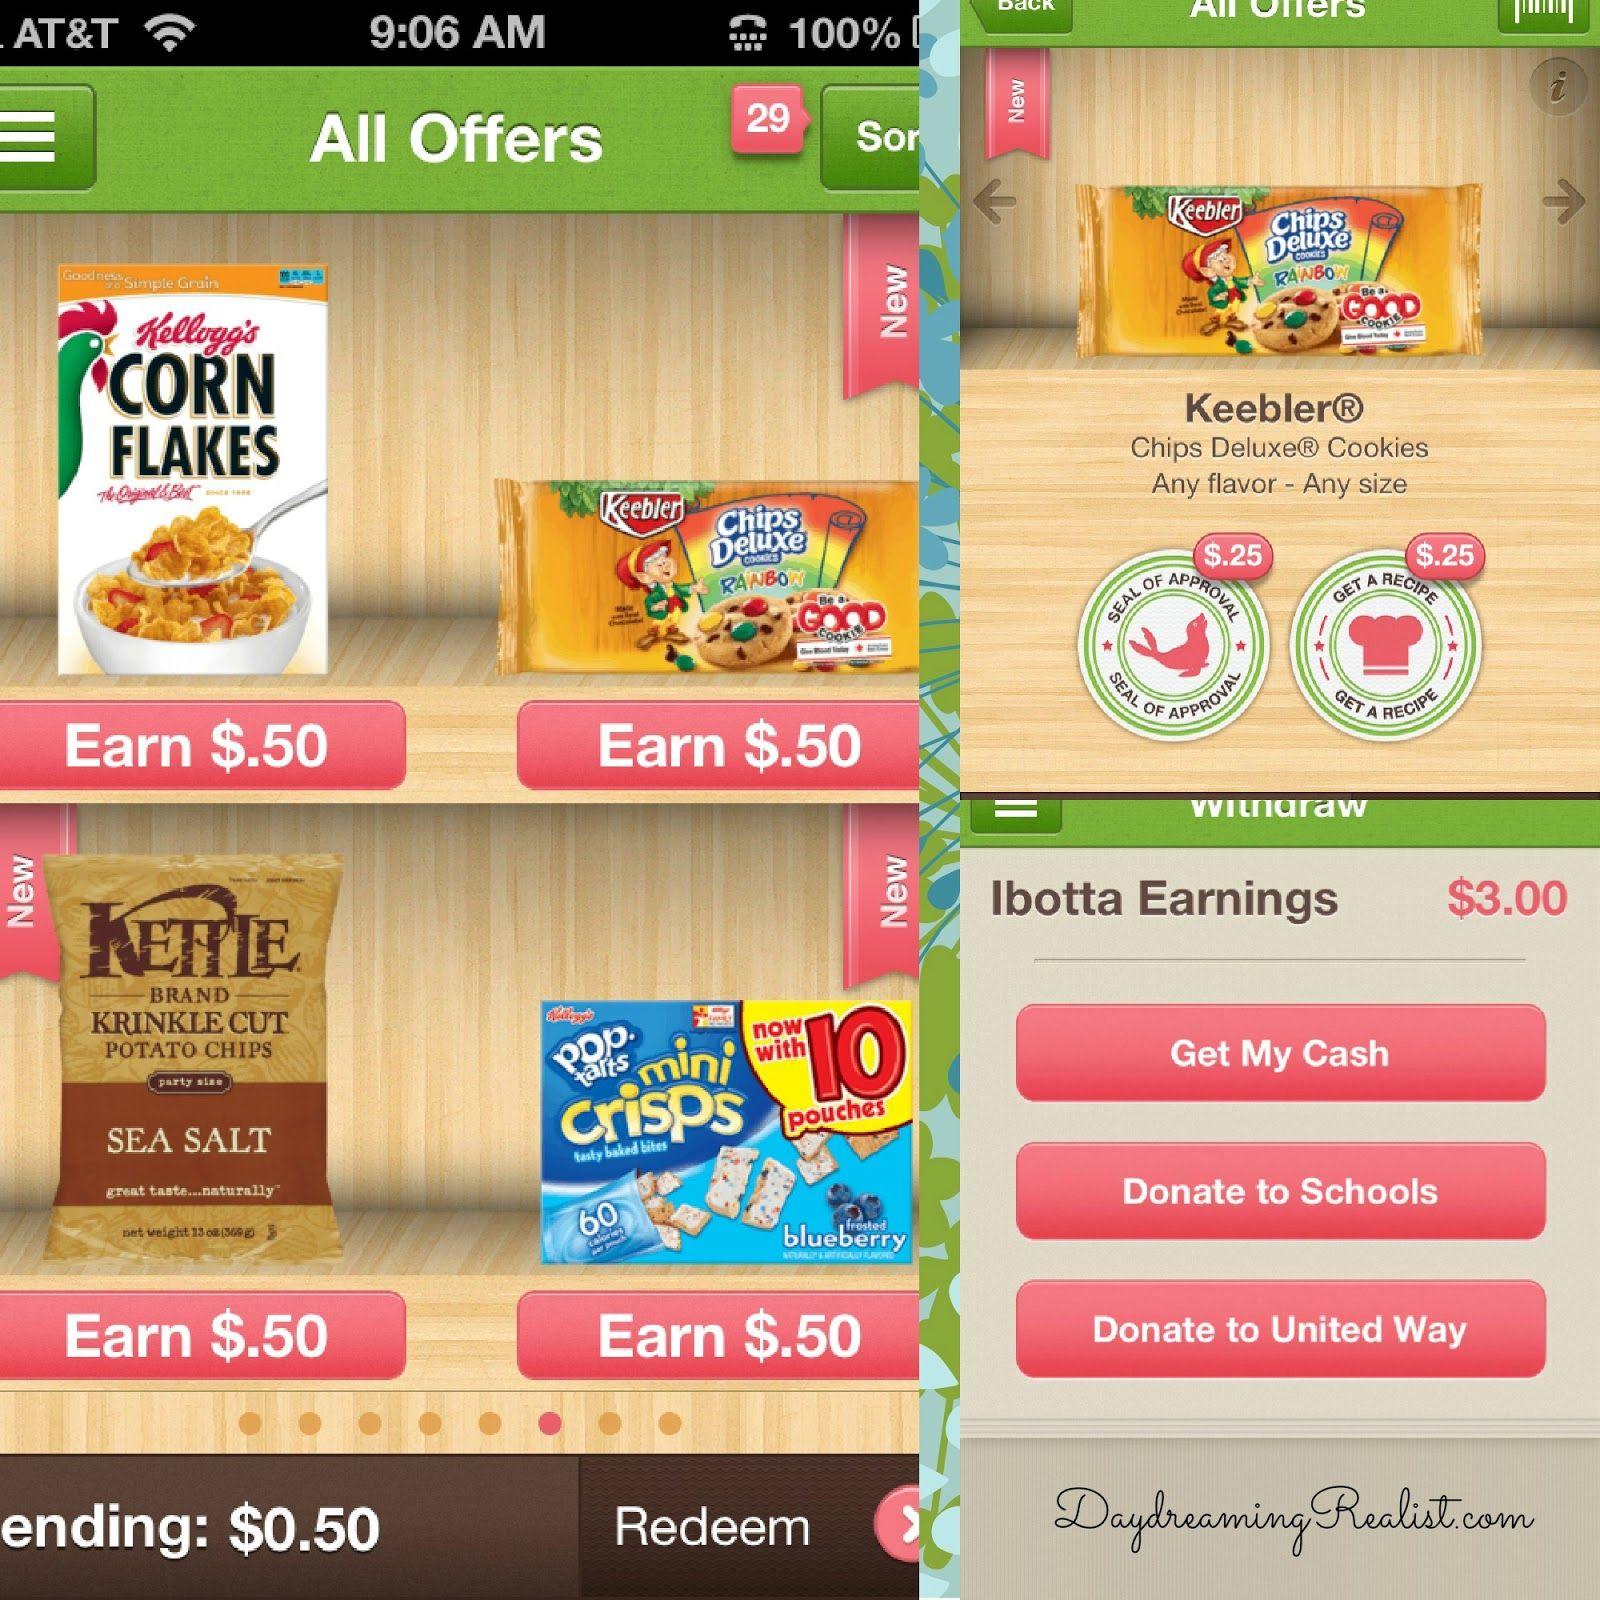 Earn Money With This Free App Ibotta! Ibotta app